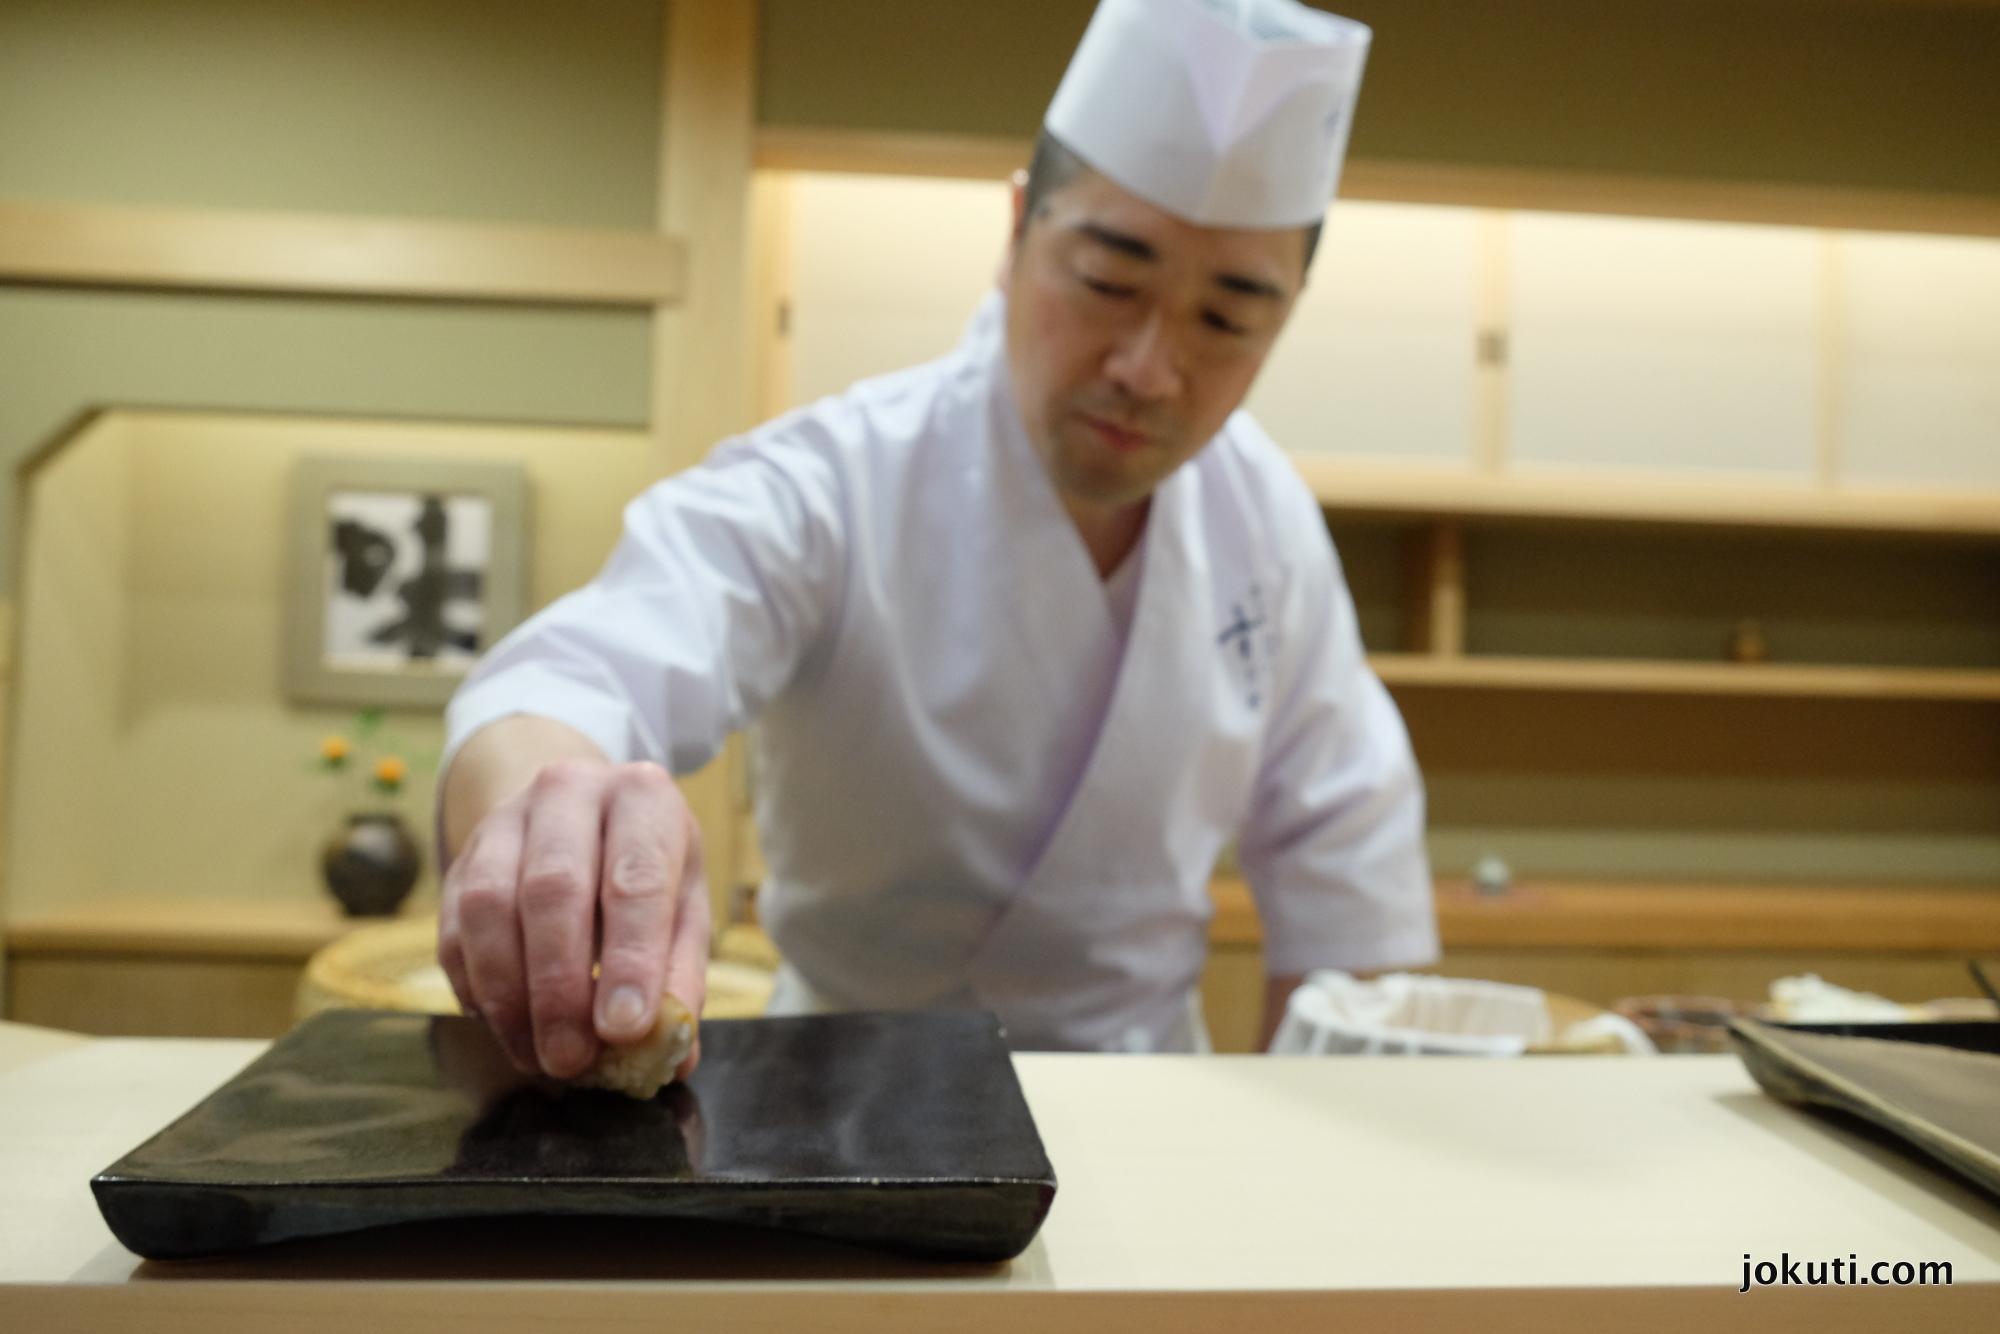 dscf5610_sugita_sushi_michelin_tokyo_japan_vilagevo_jokuti.jpg